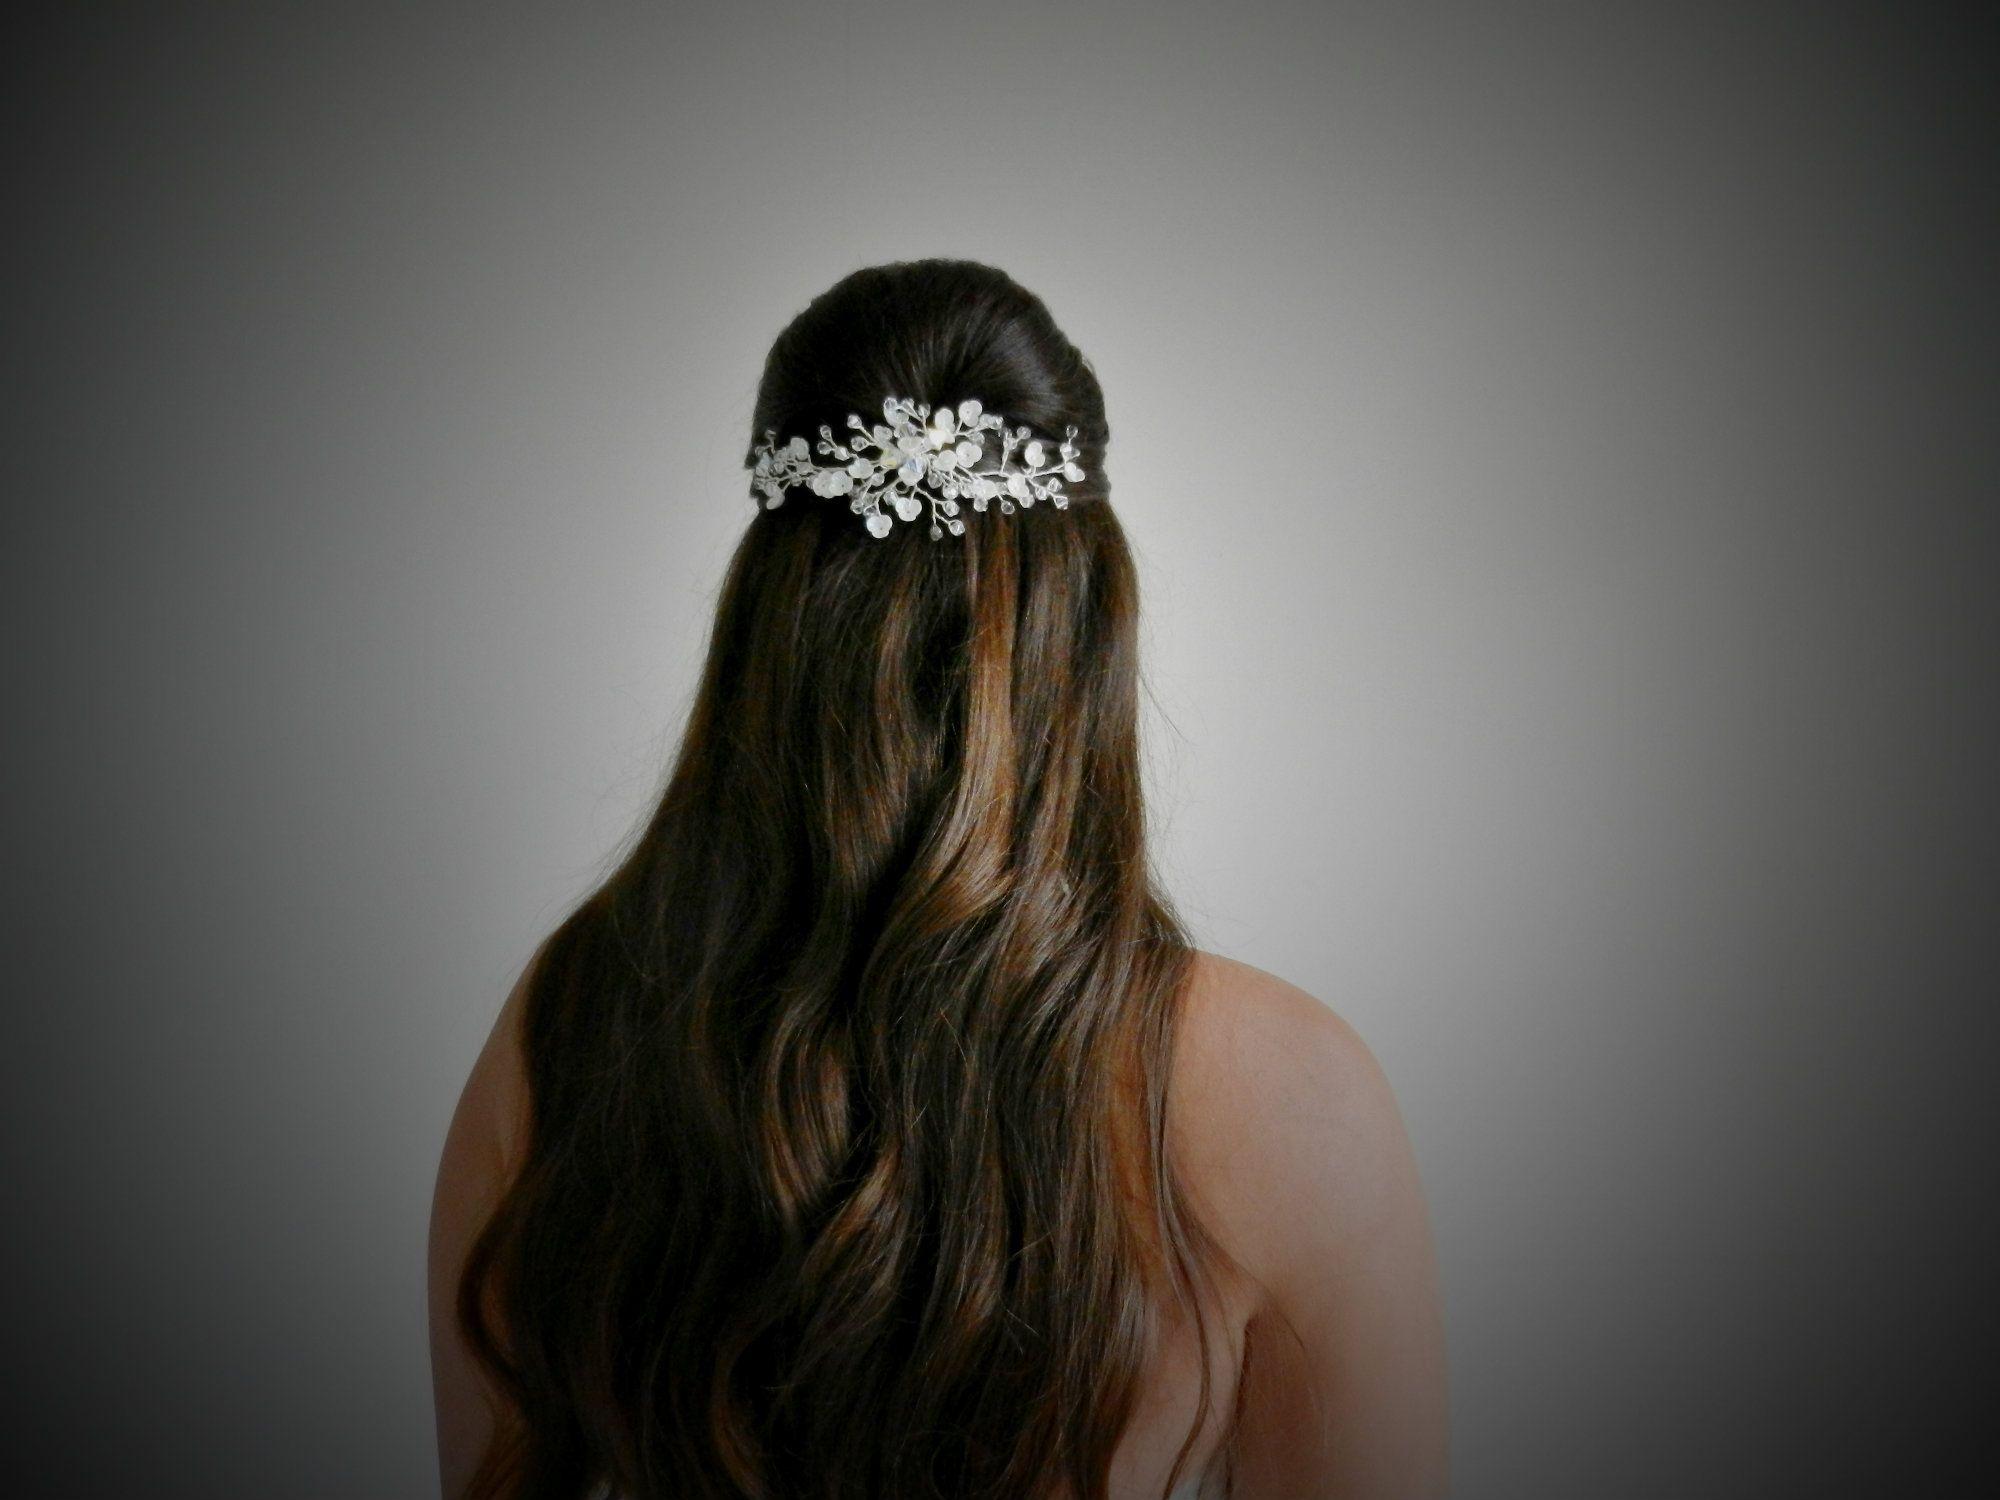 White-pink-flower-bridal-wedding-hair-accessory-UK